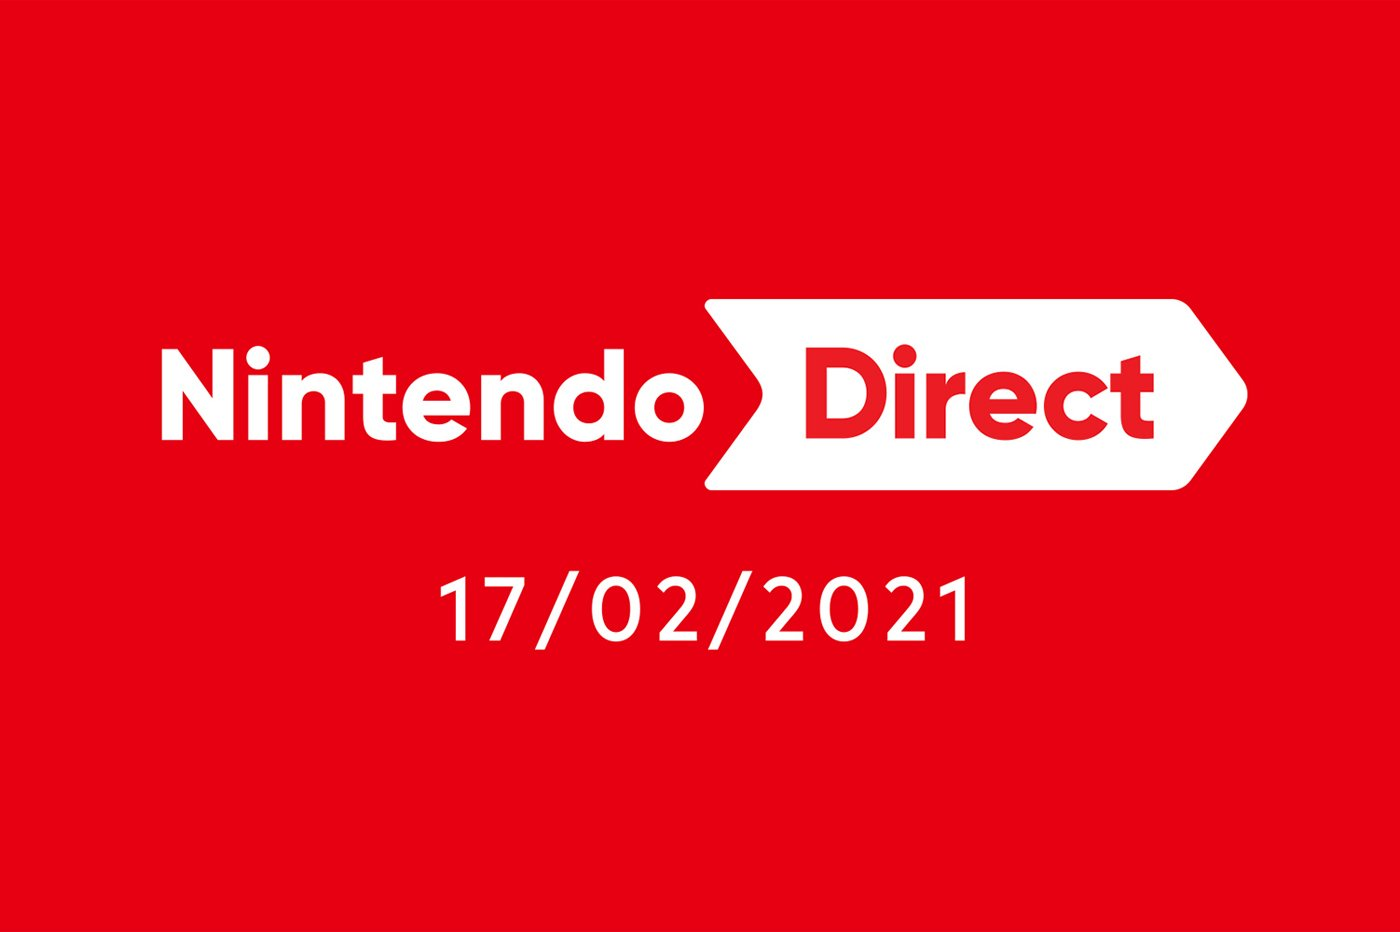 Mario Golf, Zelda et Splatoon 3… Ce qu'il fallait retenir du dernier Nintendo Direct - Le Journal du Geek